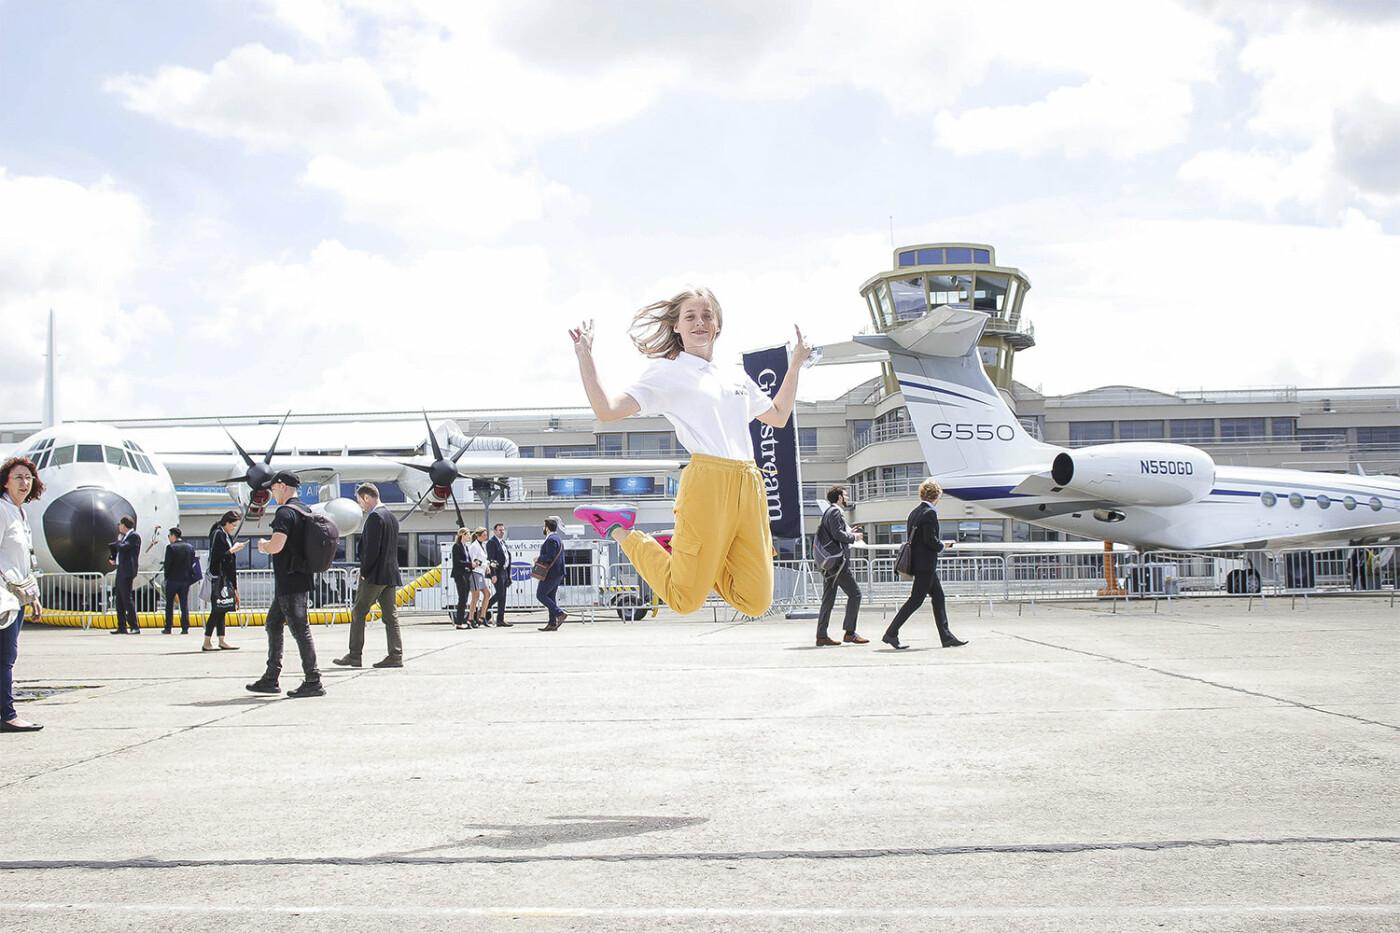 Борис Колесников со школьниками Донбасса посетил крупнейший авиасалон во Франции, фото-6